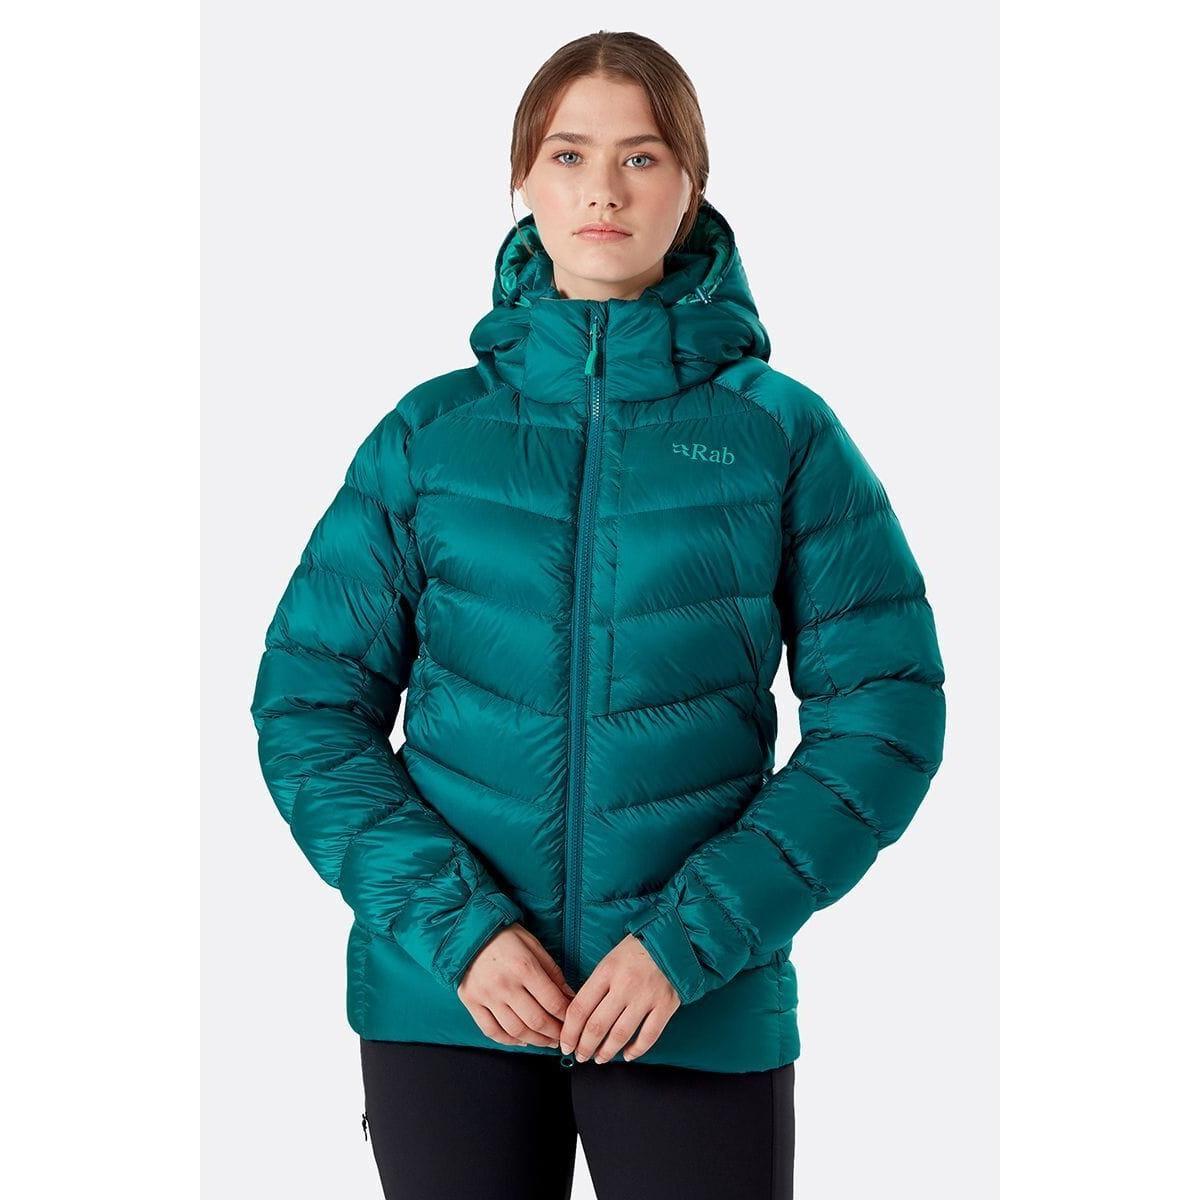 Rab Women's Rab Axion Pro Jacket - Green